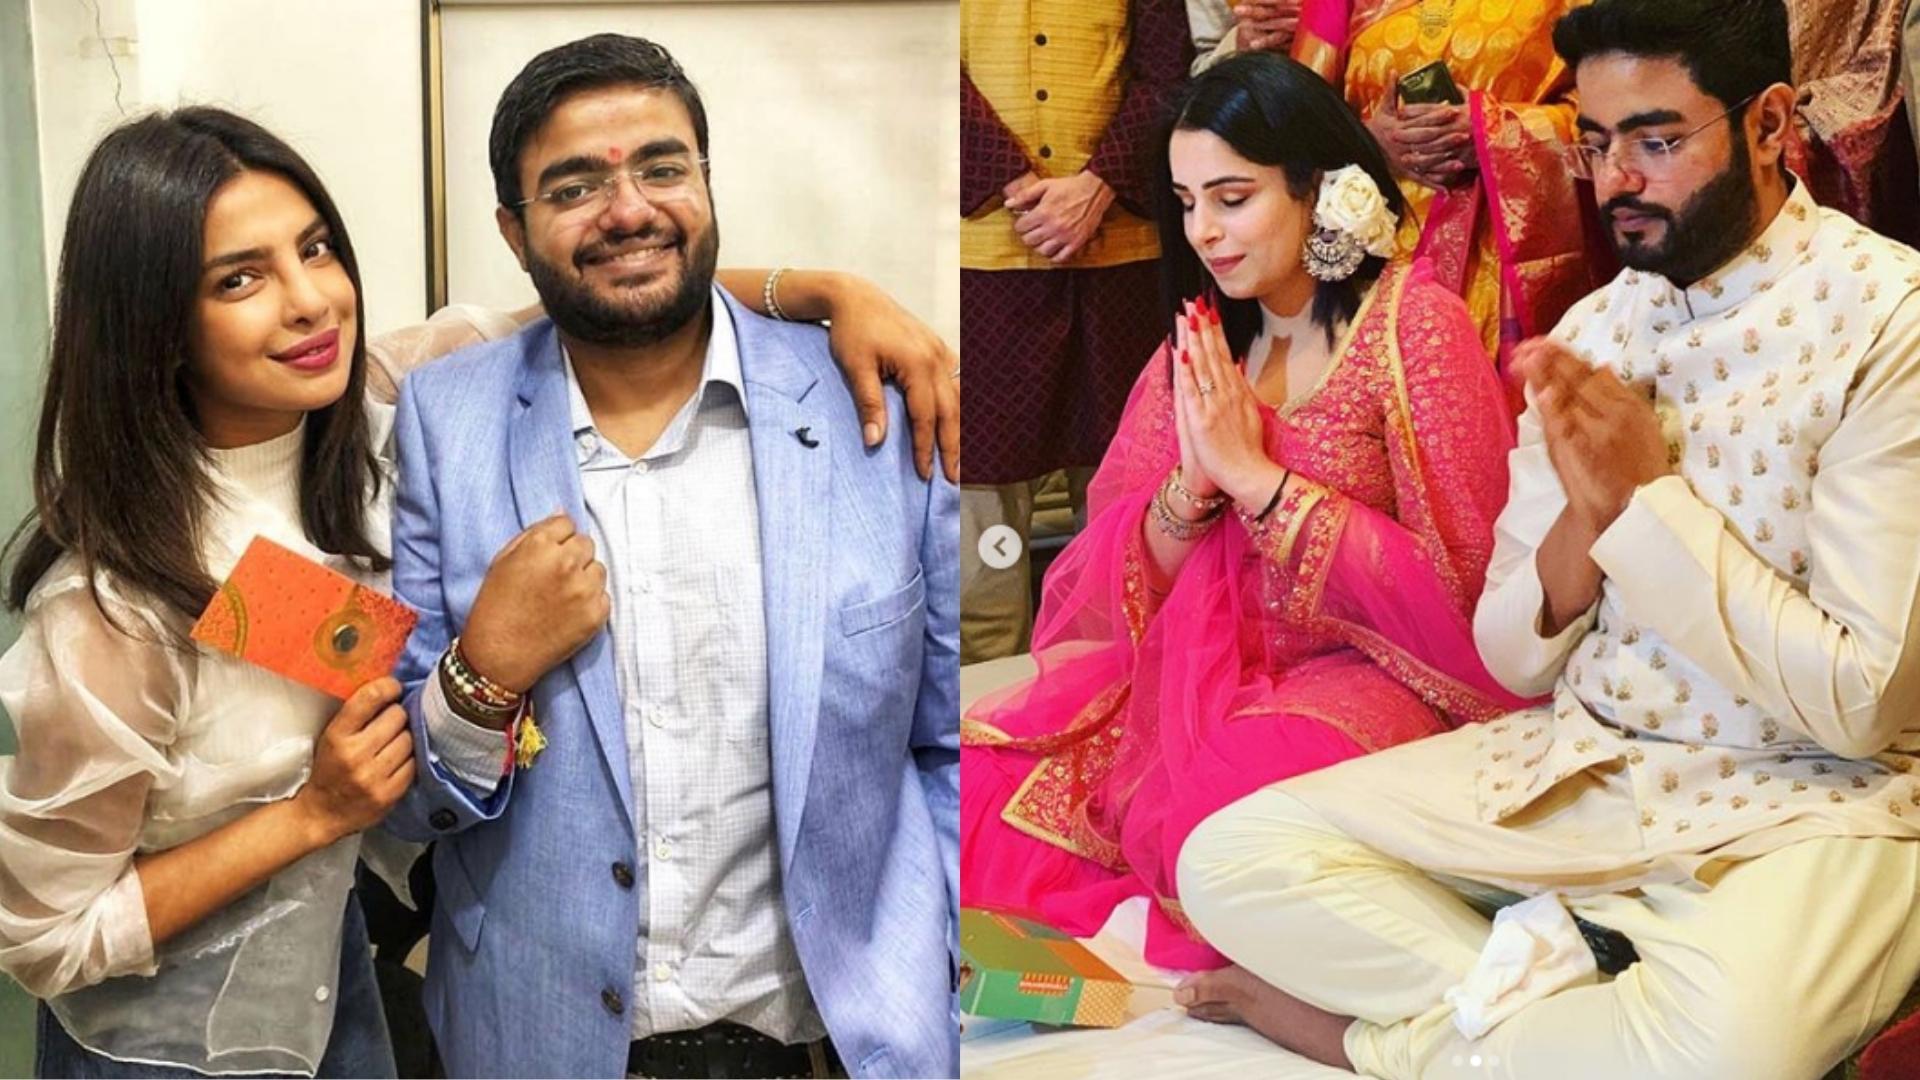 Priyanka Chopra's Brother Siddharth's Wedding Called Off?